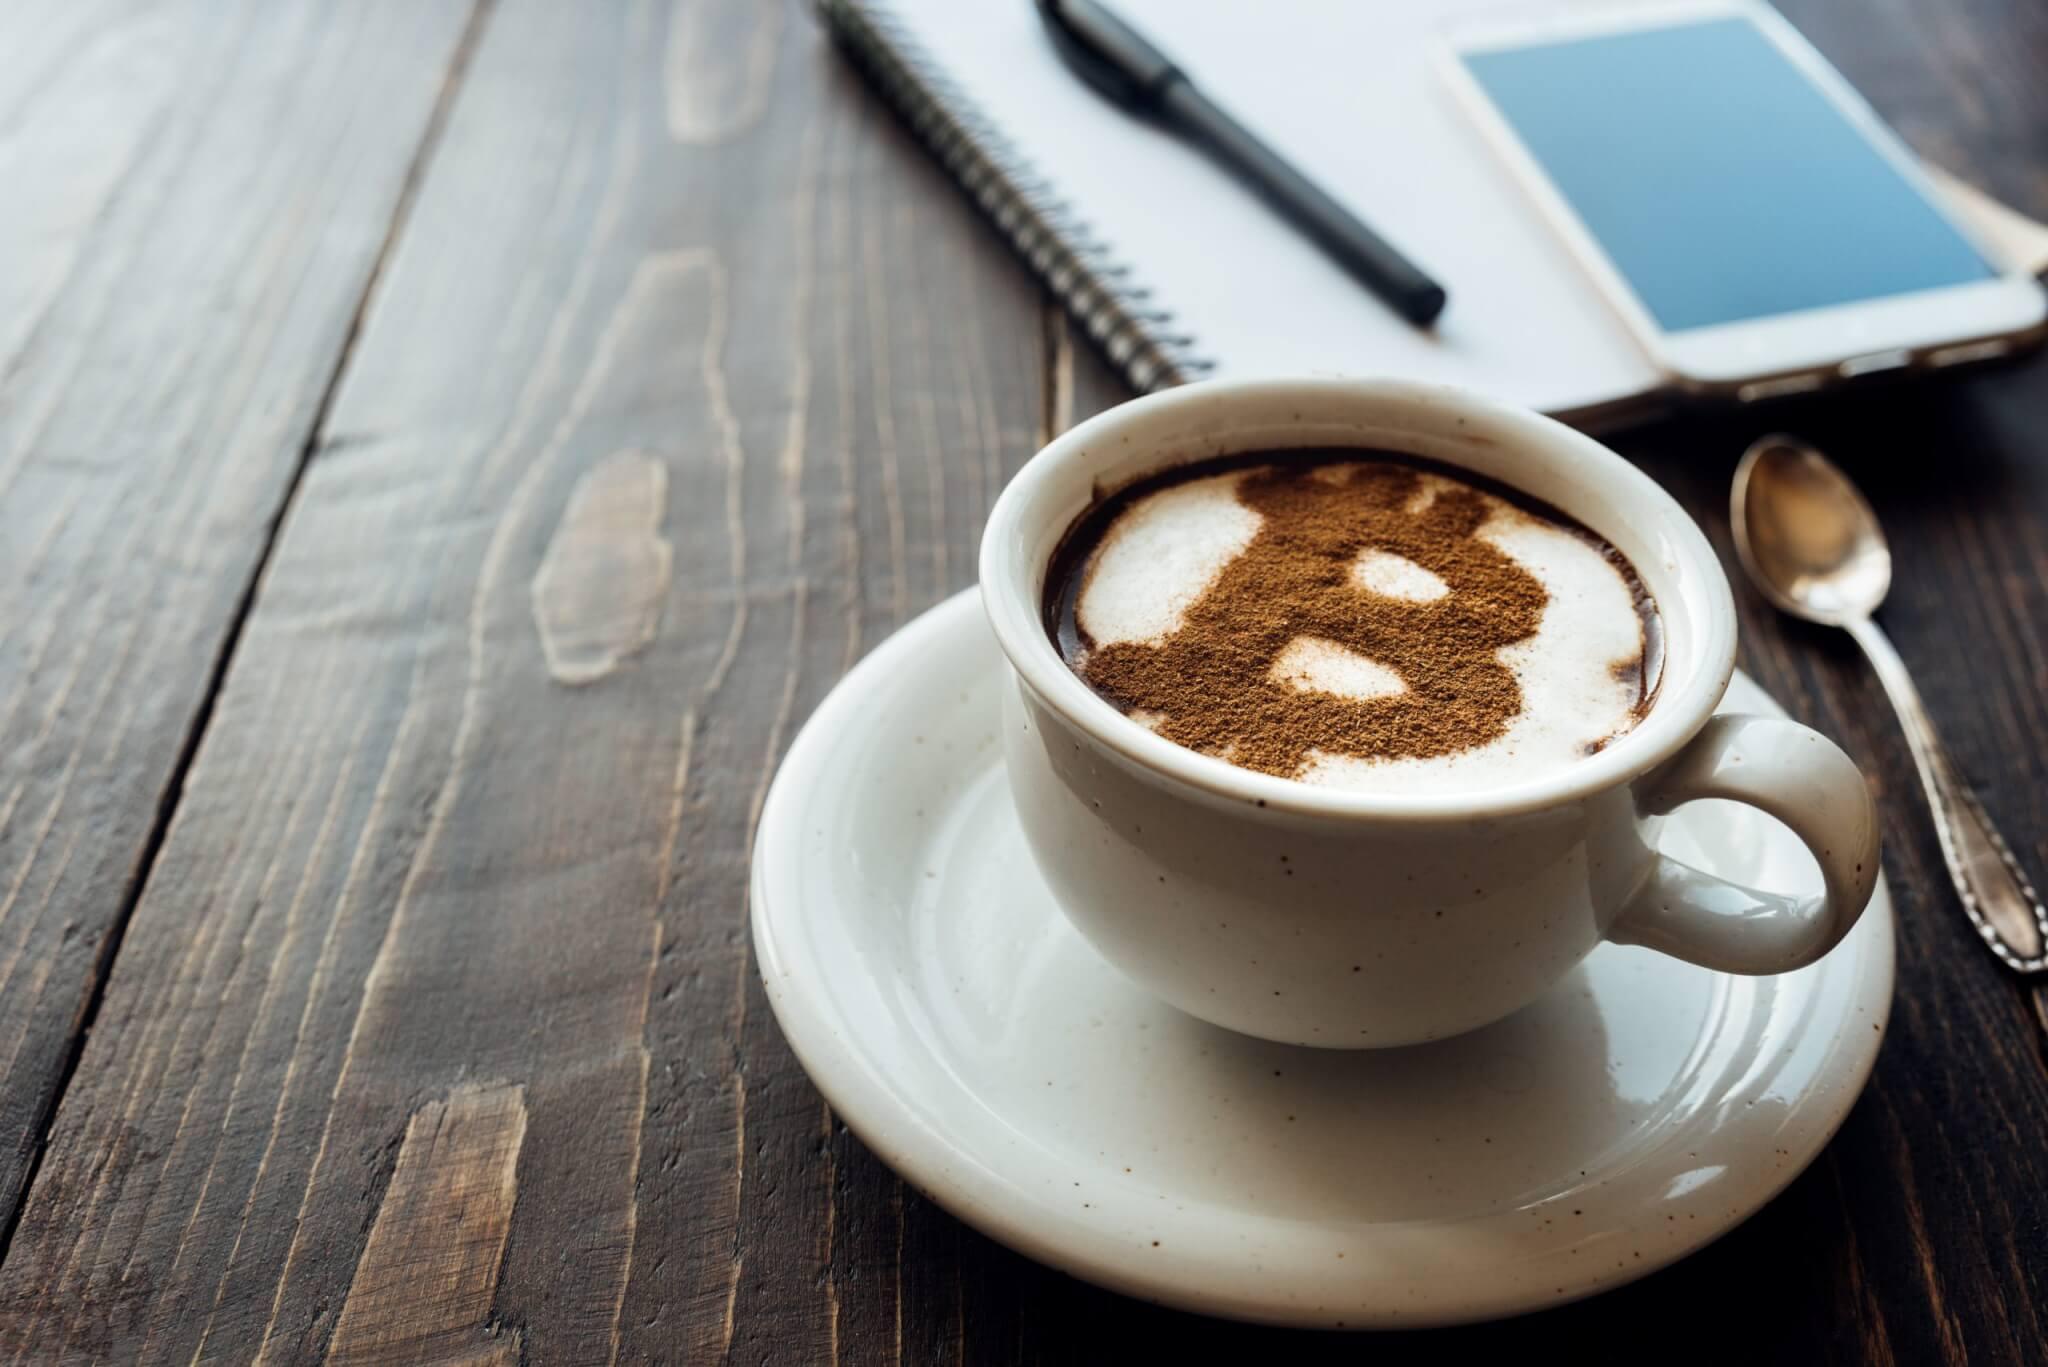 welke crypto kopen / welke bitcoin kopen